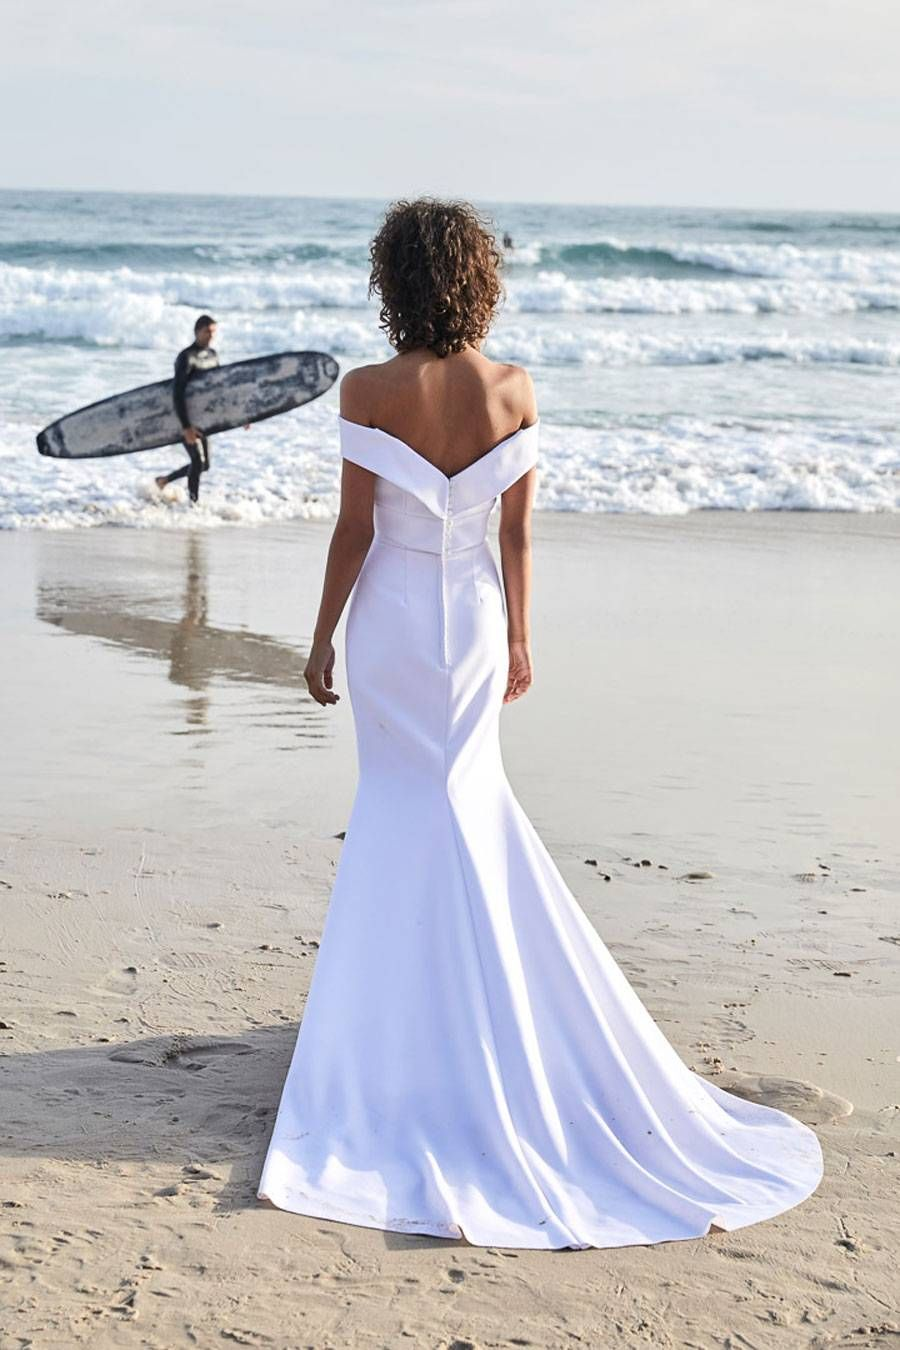 Trendy wedding dresses  Modern Wedding Dresses for Fashion Focused Brides uUntamed Paradise